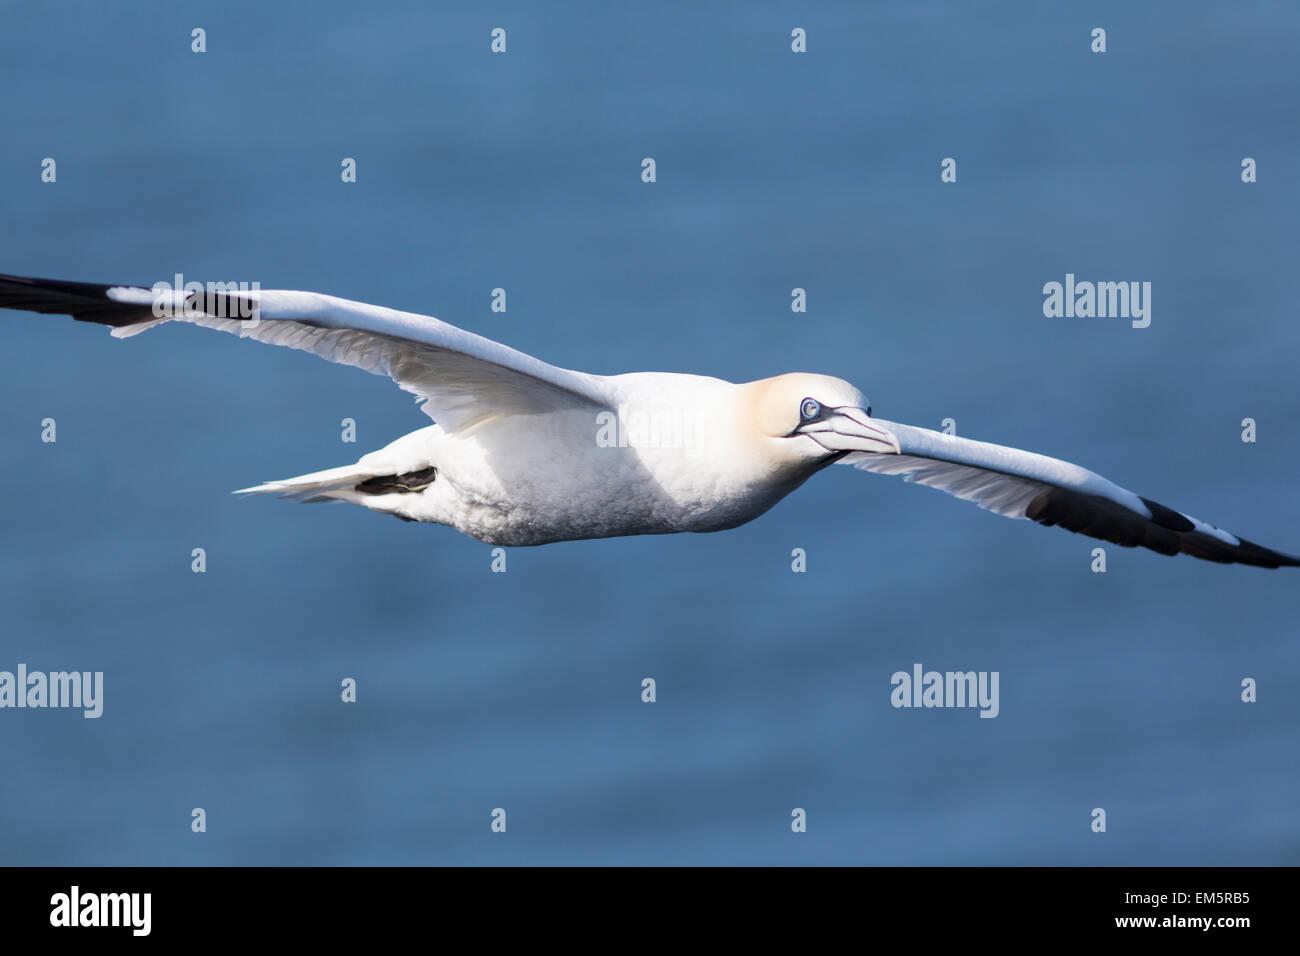 UK, Bempton Cliffs, Gannet in flight. - Stock Image